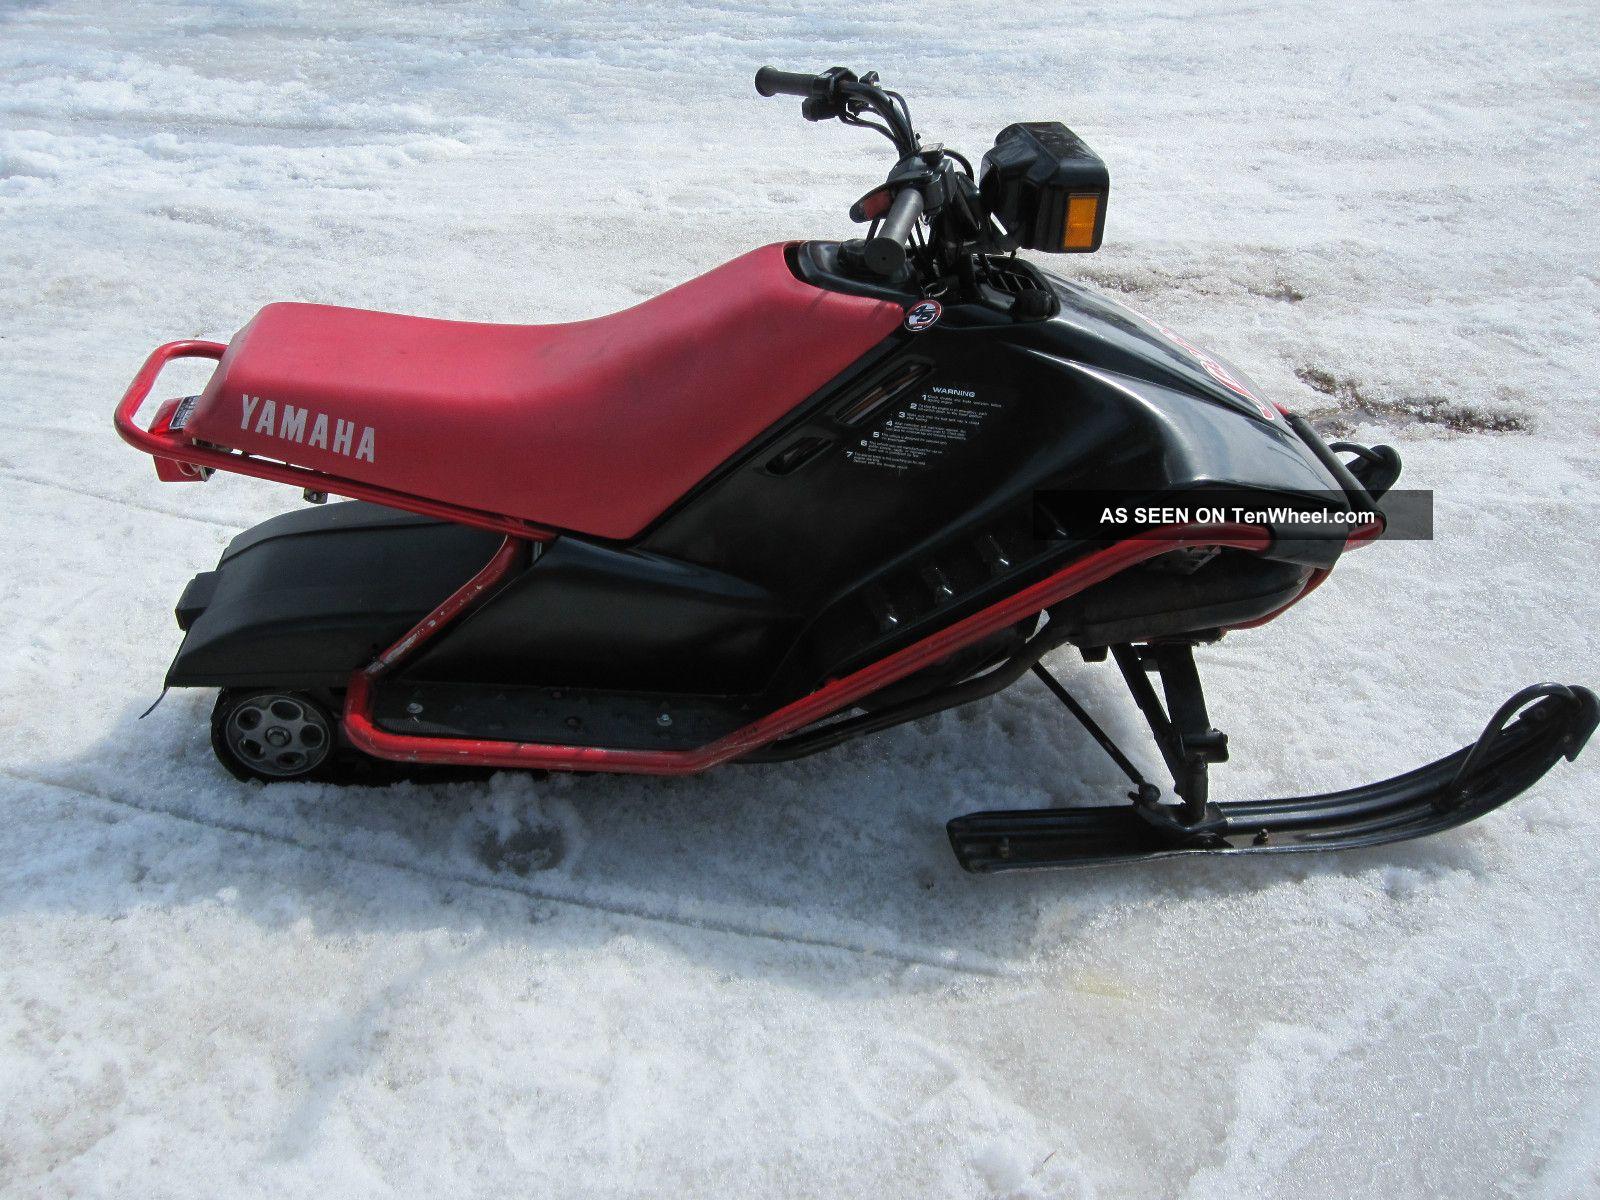 1989 yamaha sno scoot for Yamaha sno scoot